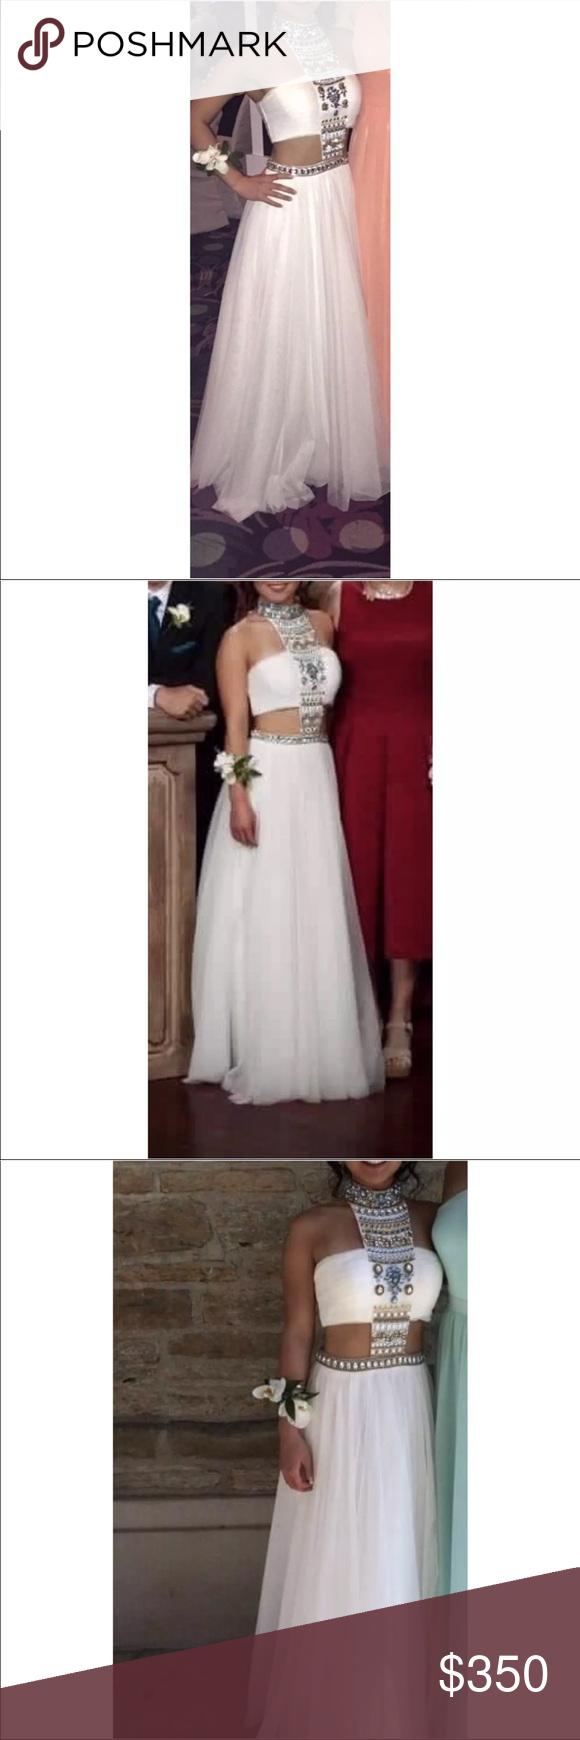 Sherri hill white cutout prom dress size sherri hill white prom